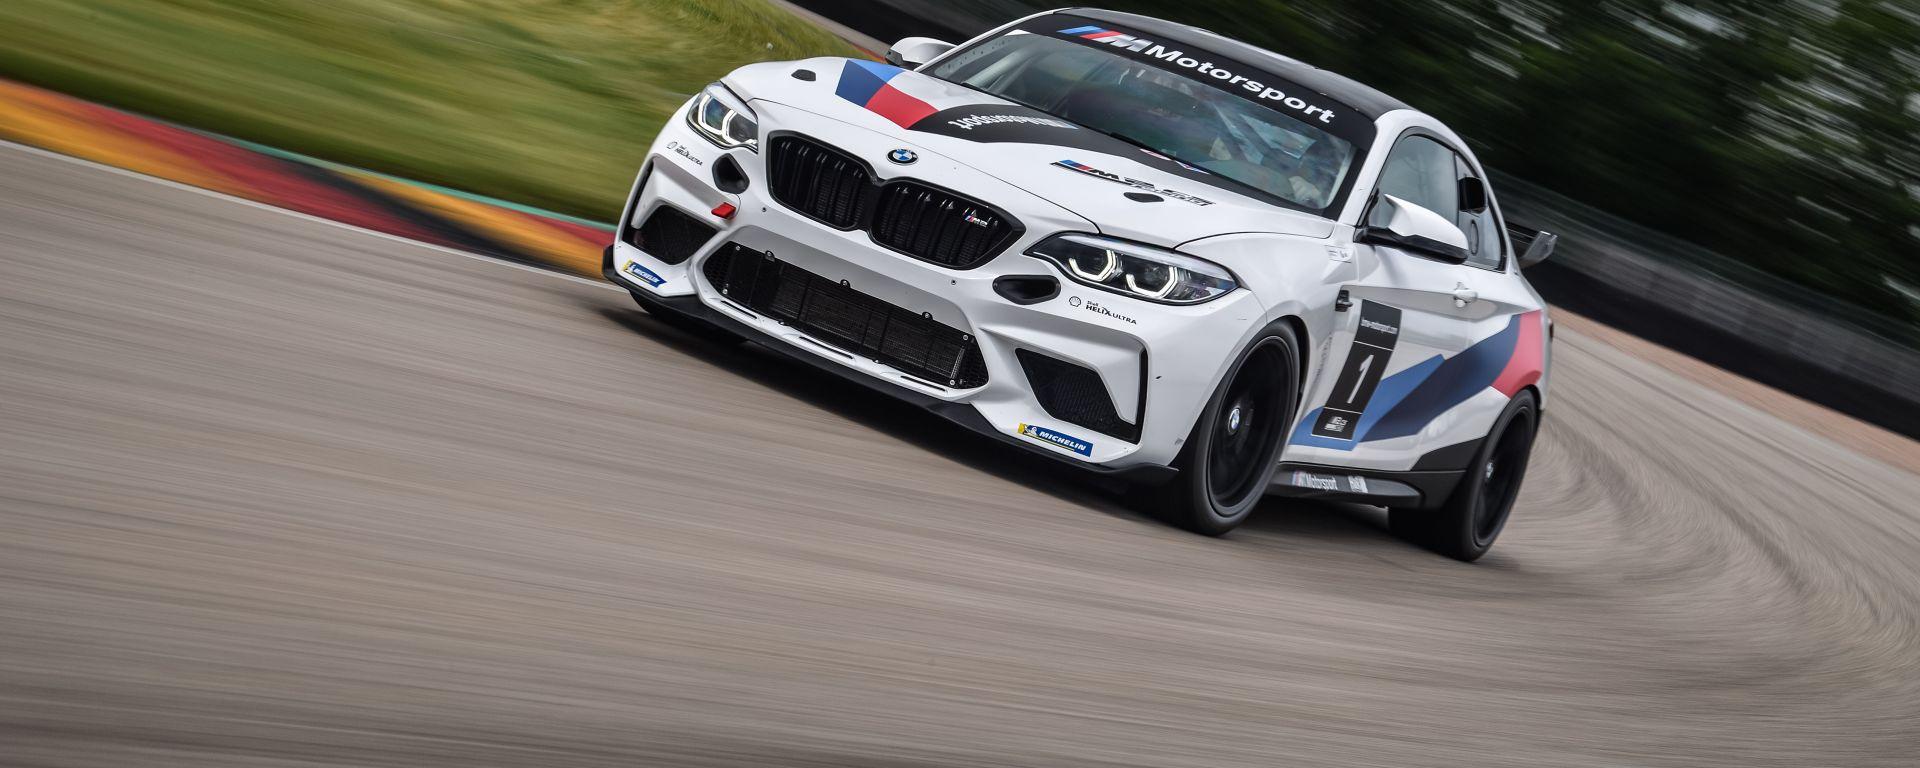 La Bmw M2 CS in versione Racing Cup in pista